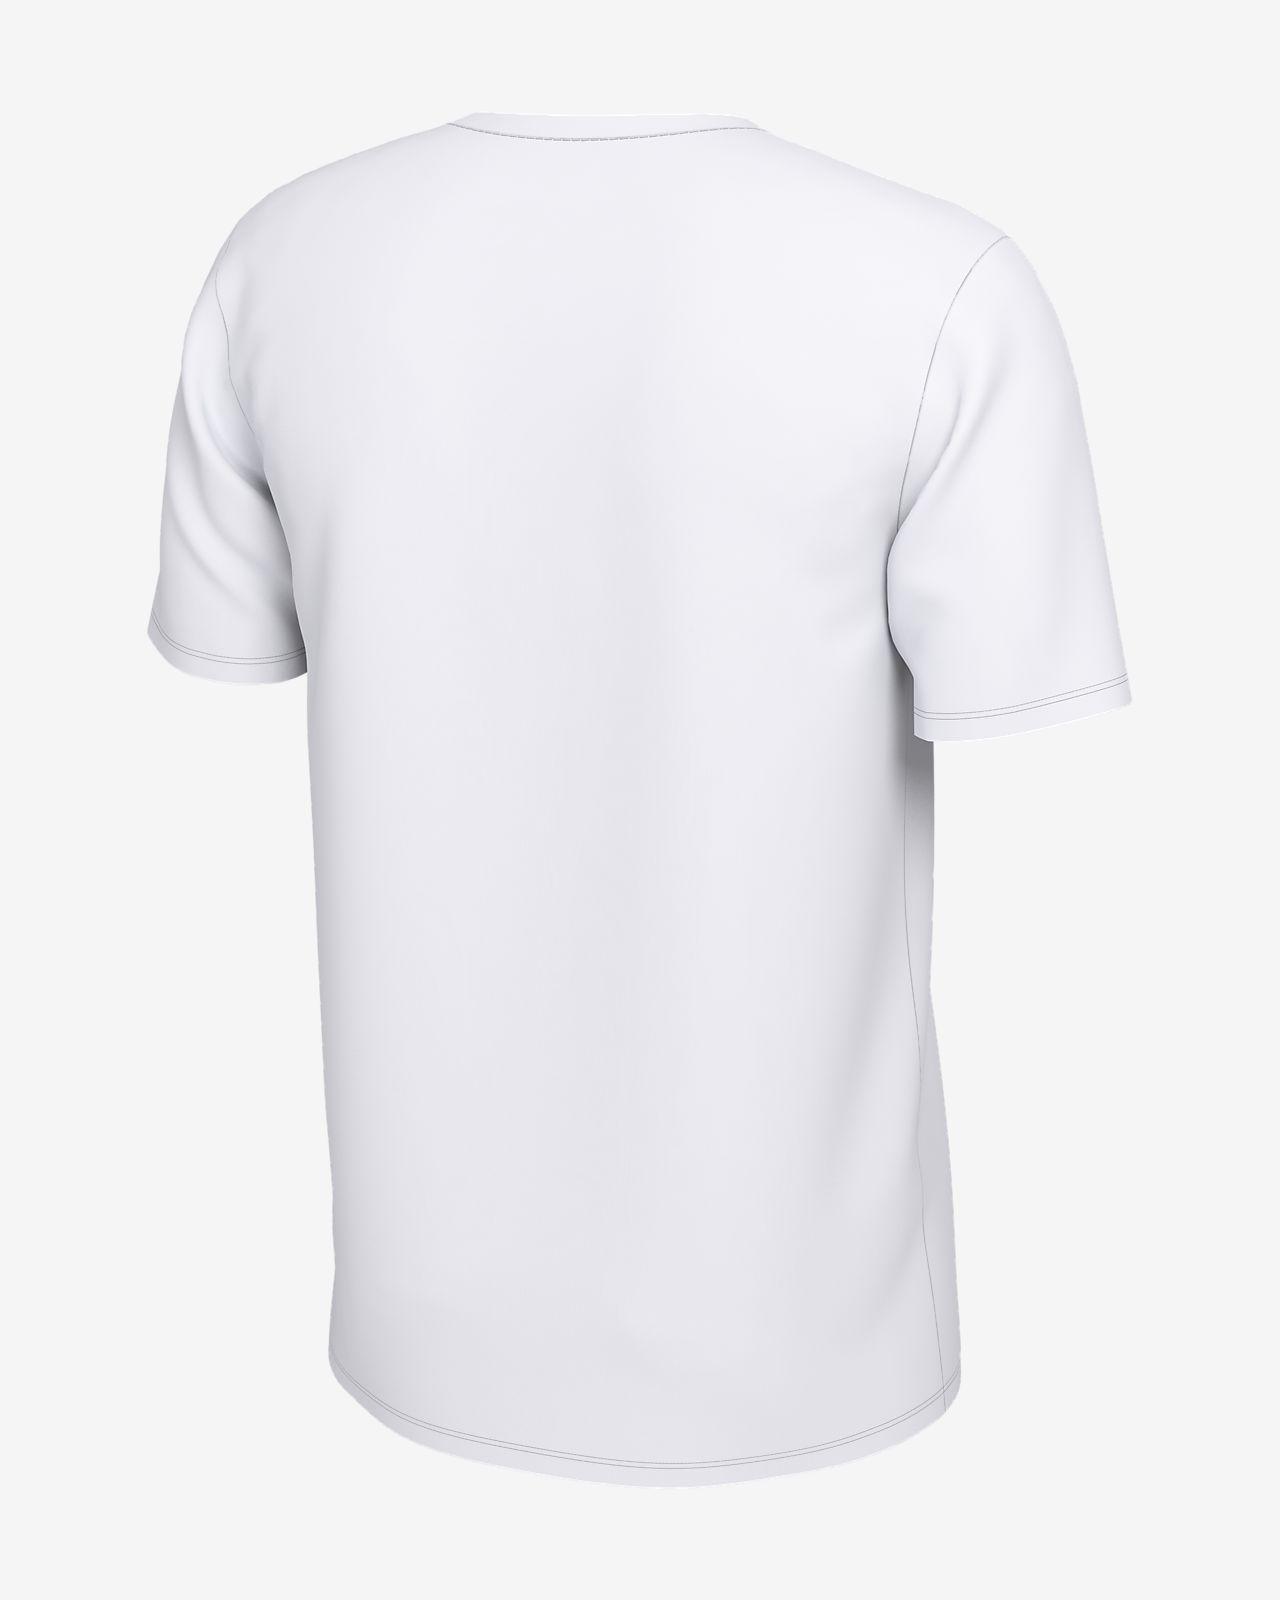 dfaf5b03d4362 Brooklyn Nets Biggie Nike Men's NBA T-Shirt . Nike.com